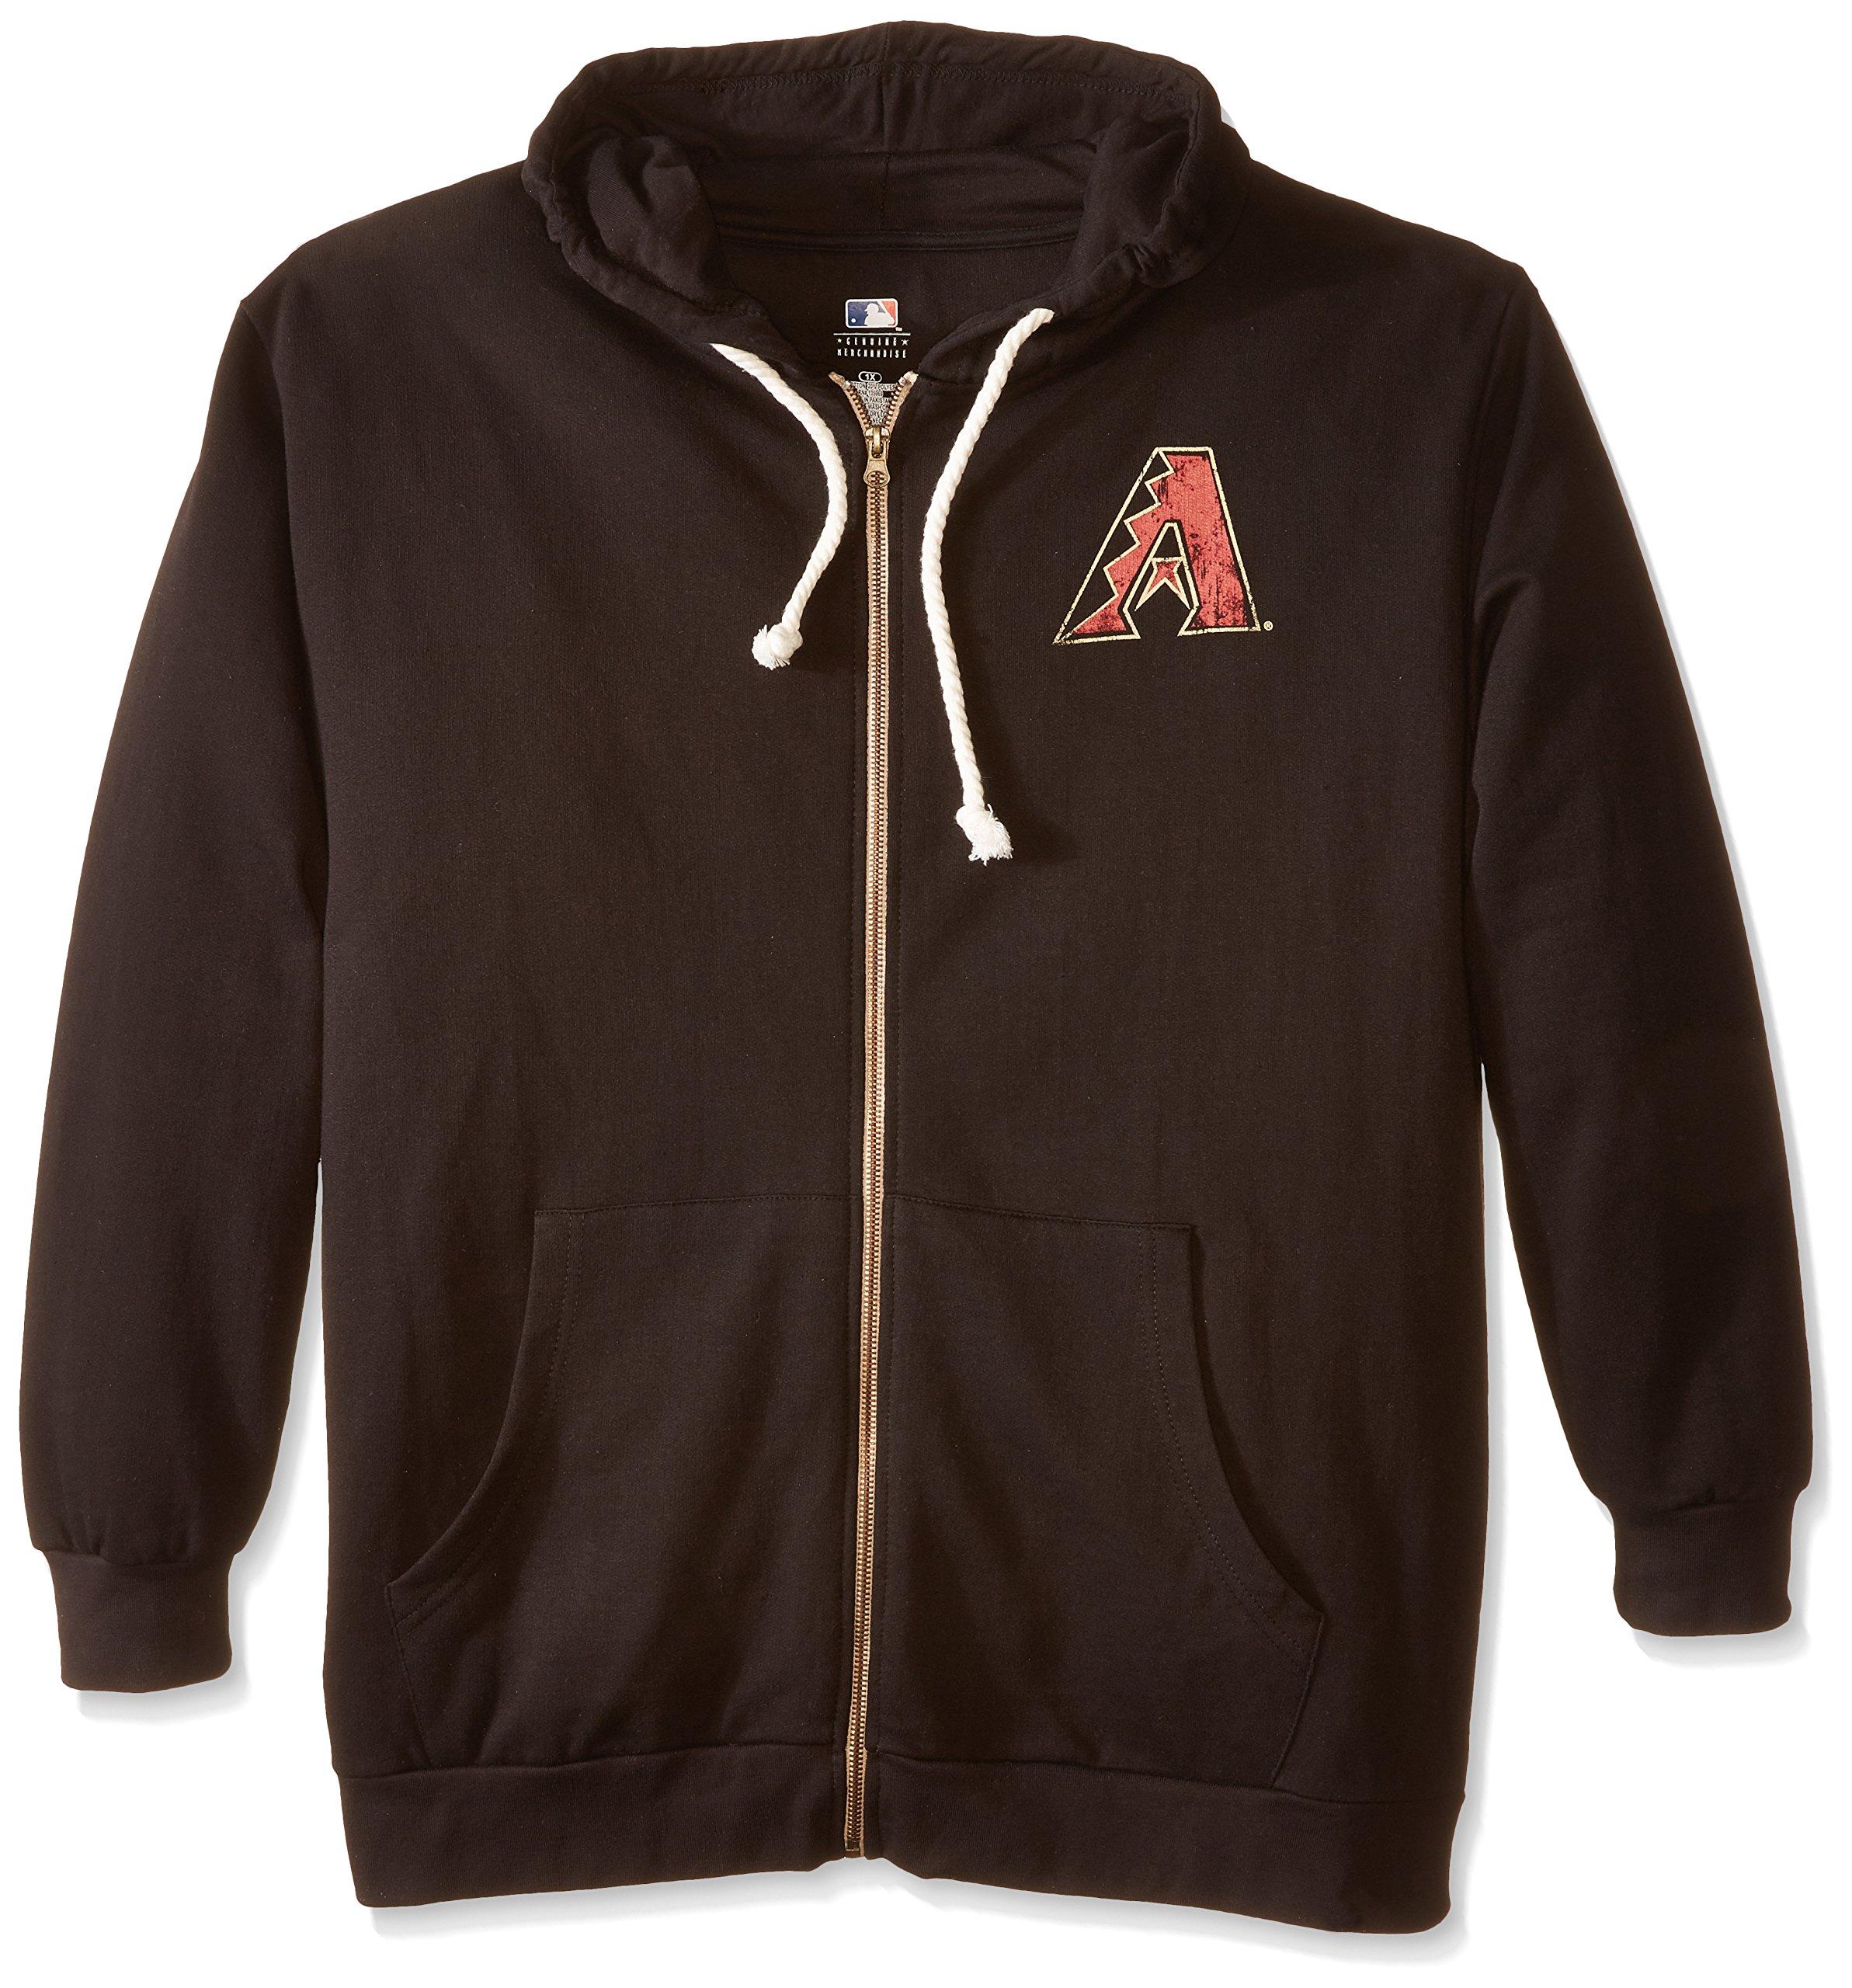 MLB Arizona Diamondbacks Women's Plus Size Zip Hood with Logo, 2X, Black by Profile Big & Tall